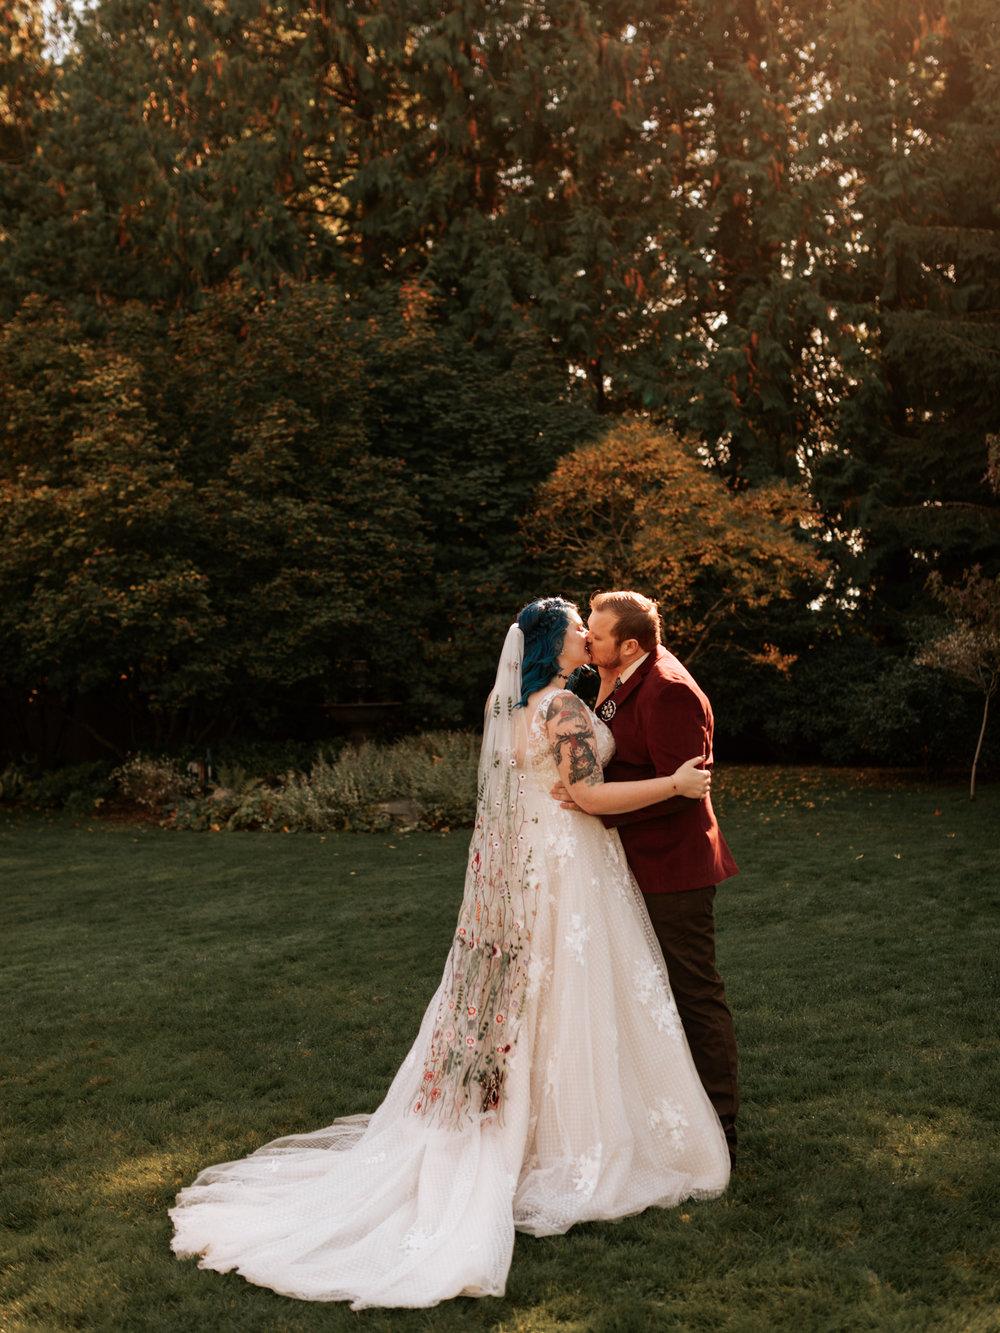 Stolen Glimpses Seattle Wedding Photographer Red Cedar Farm Wedding 38.jpg